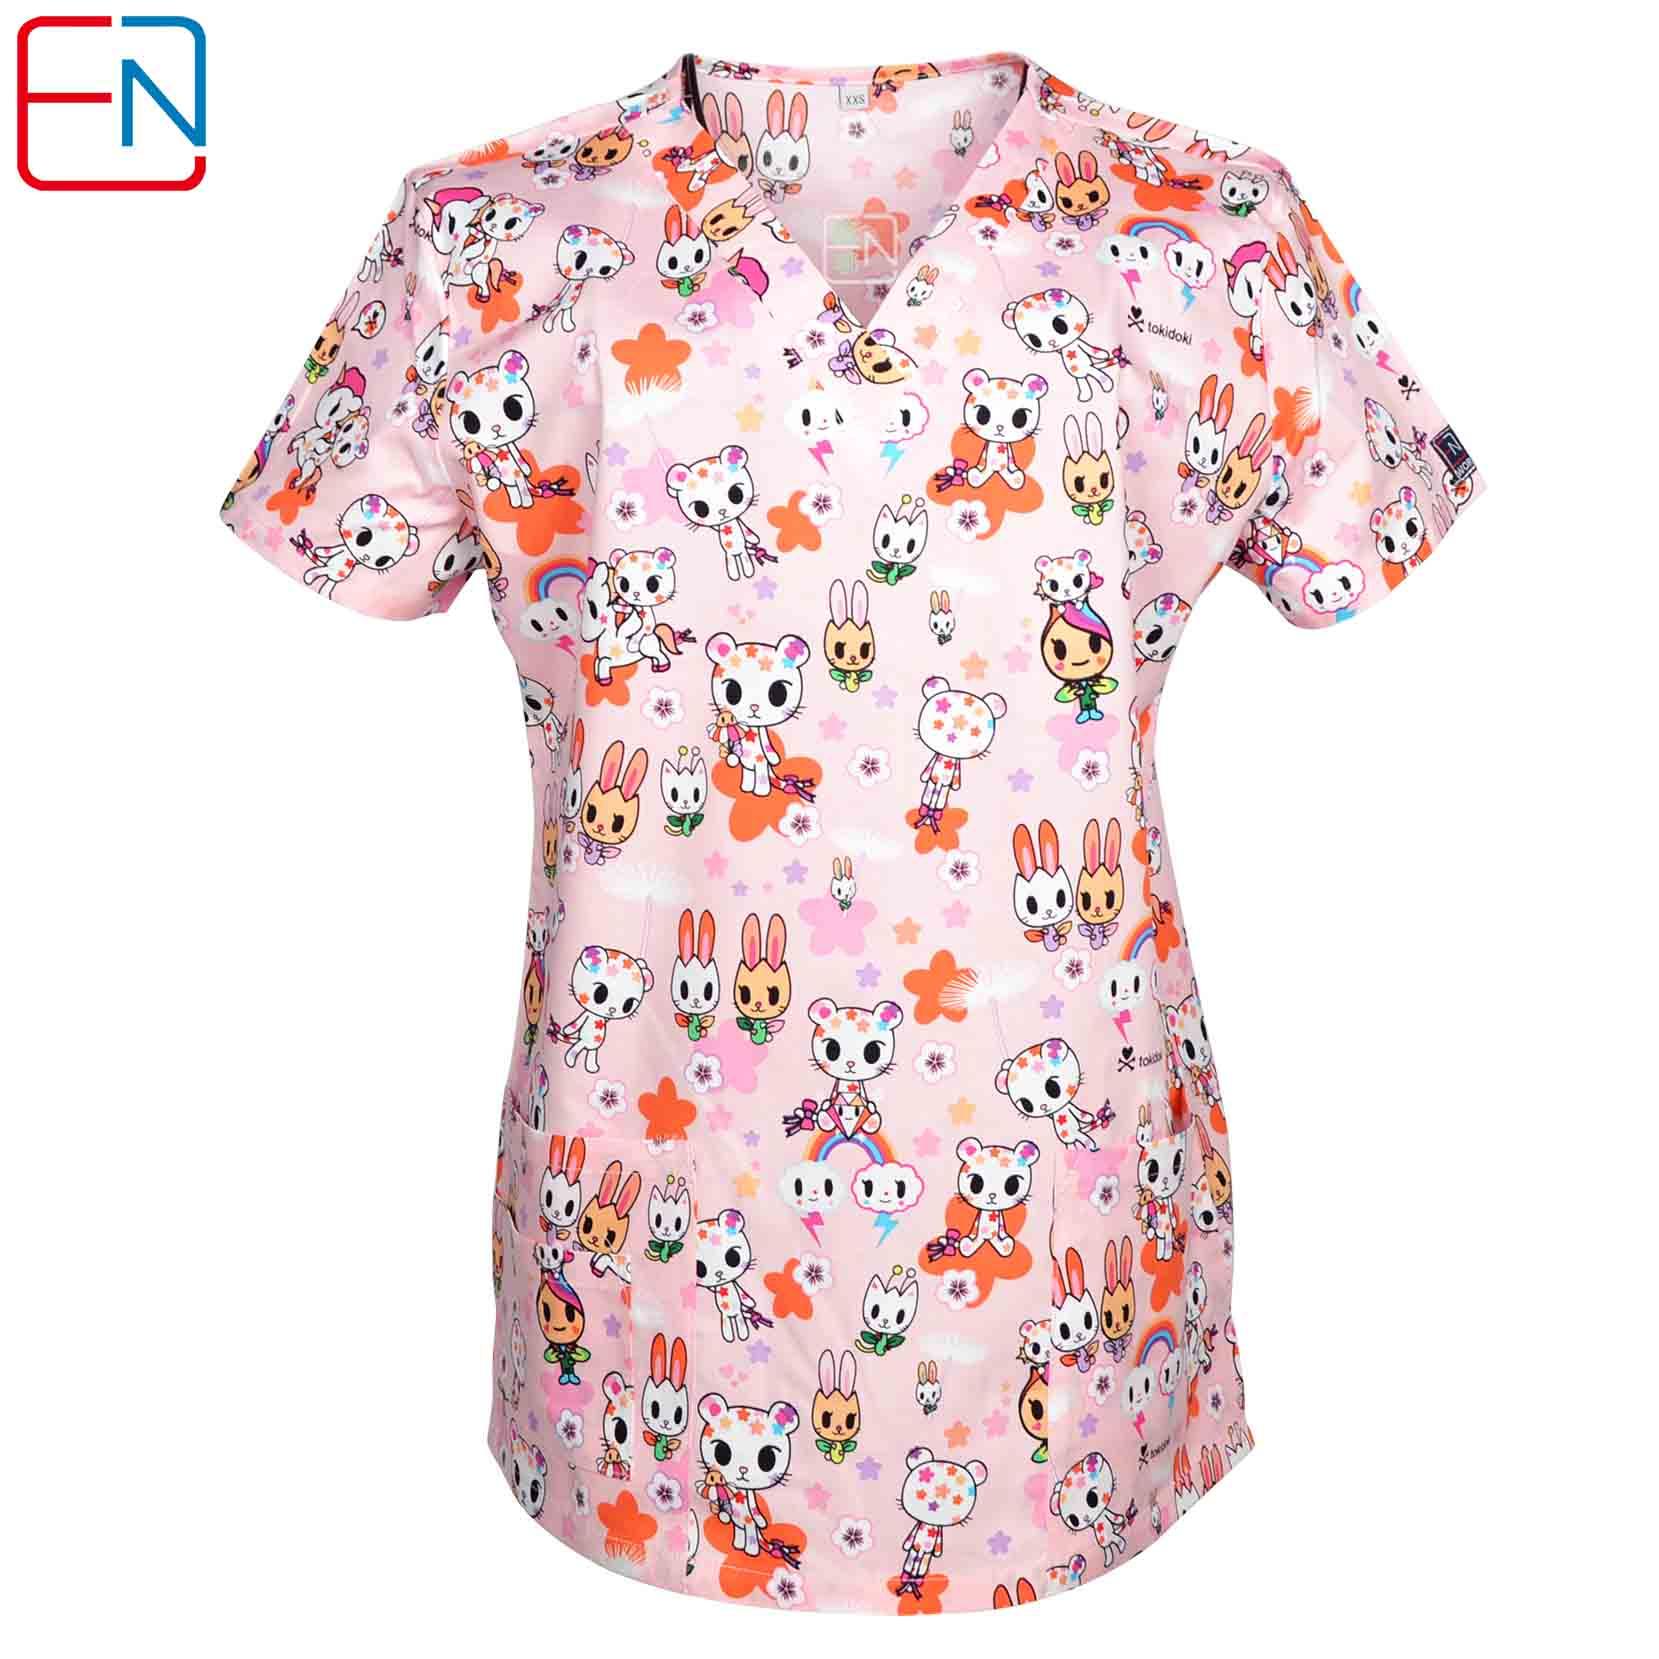 NEW Hennar Women Scrub Top With V-Neck 100% Cotton Print Surgical Medical Uniforms Hospital Nurse Scrub Tops For Women